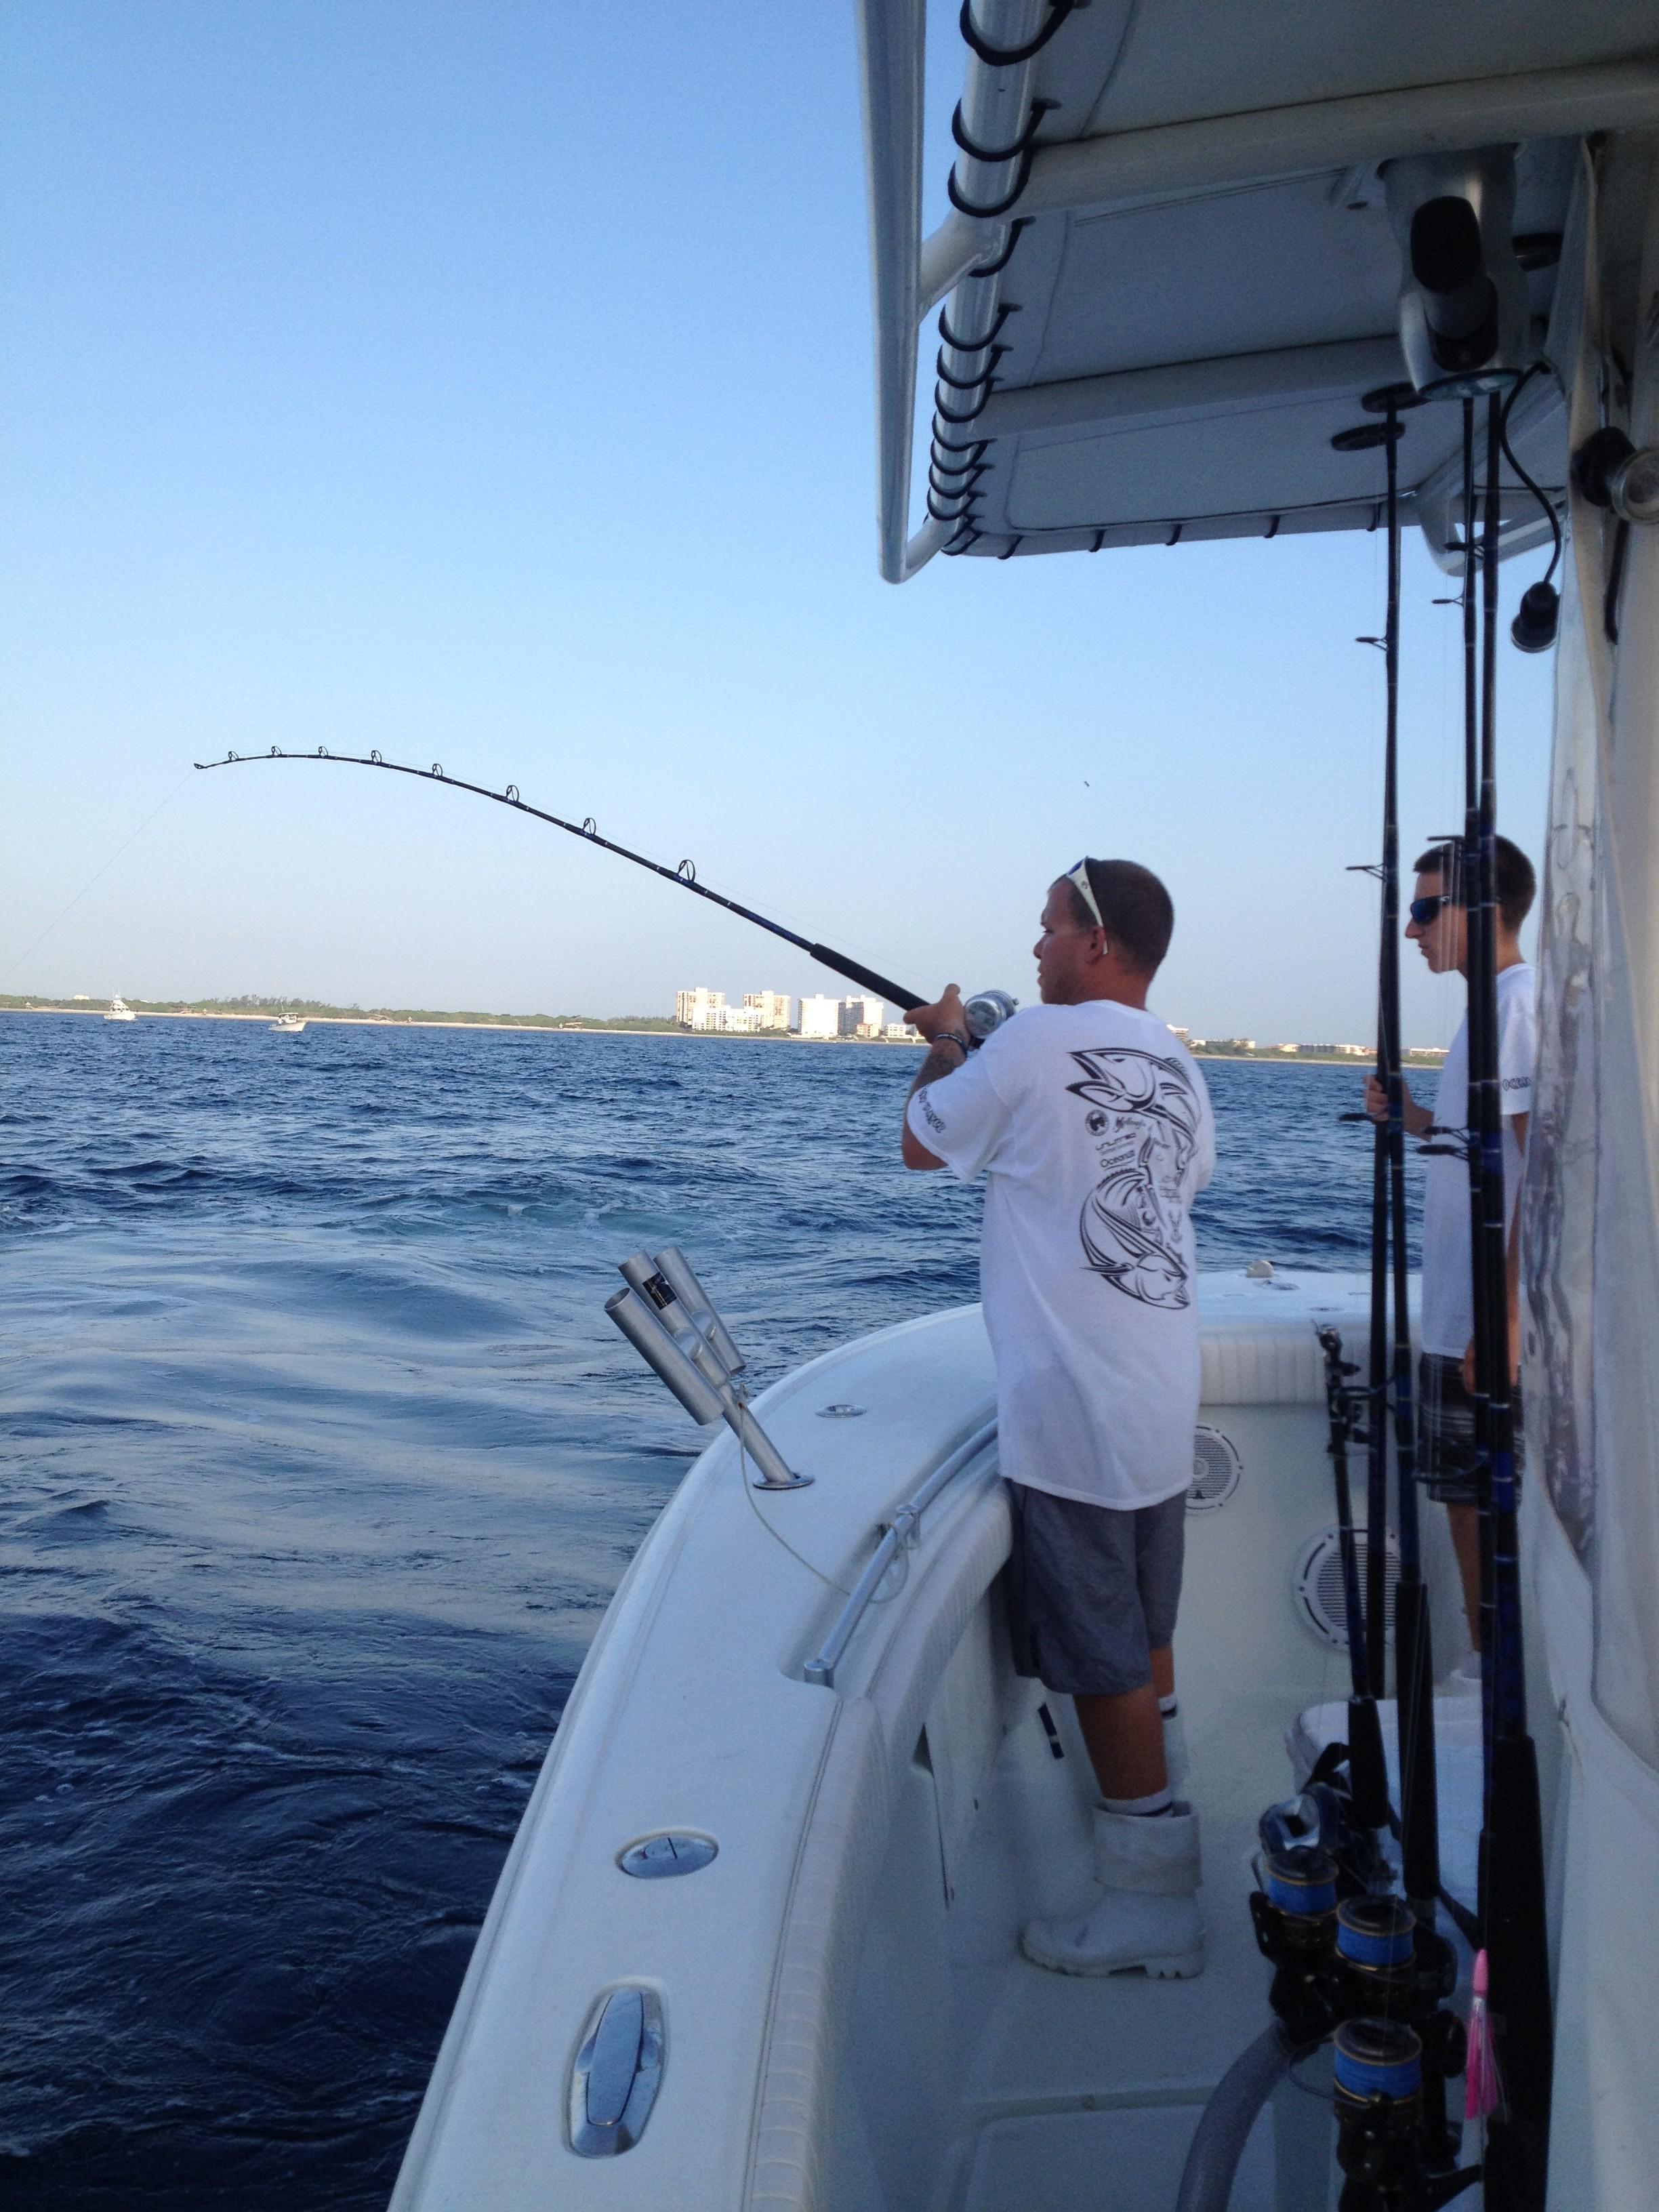 Joe on a kingfish on the Yellowfin 23